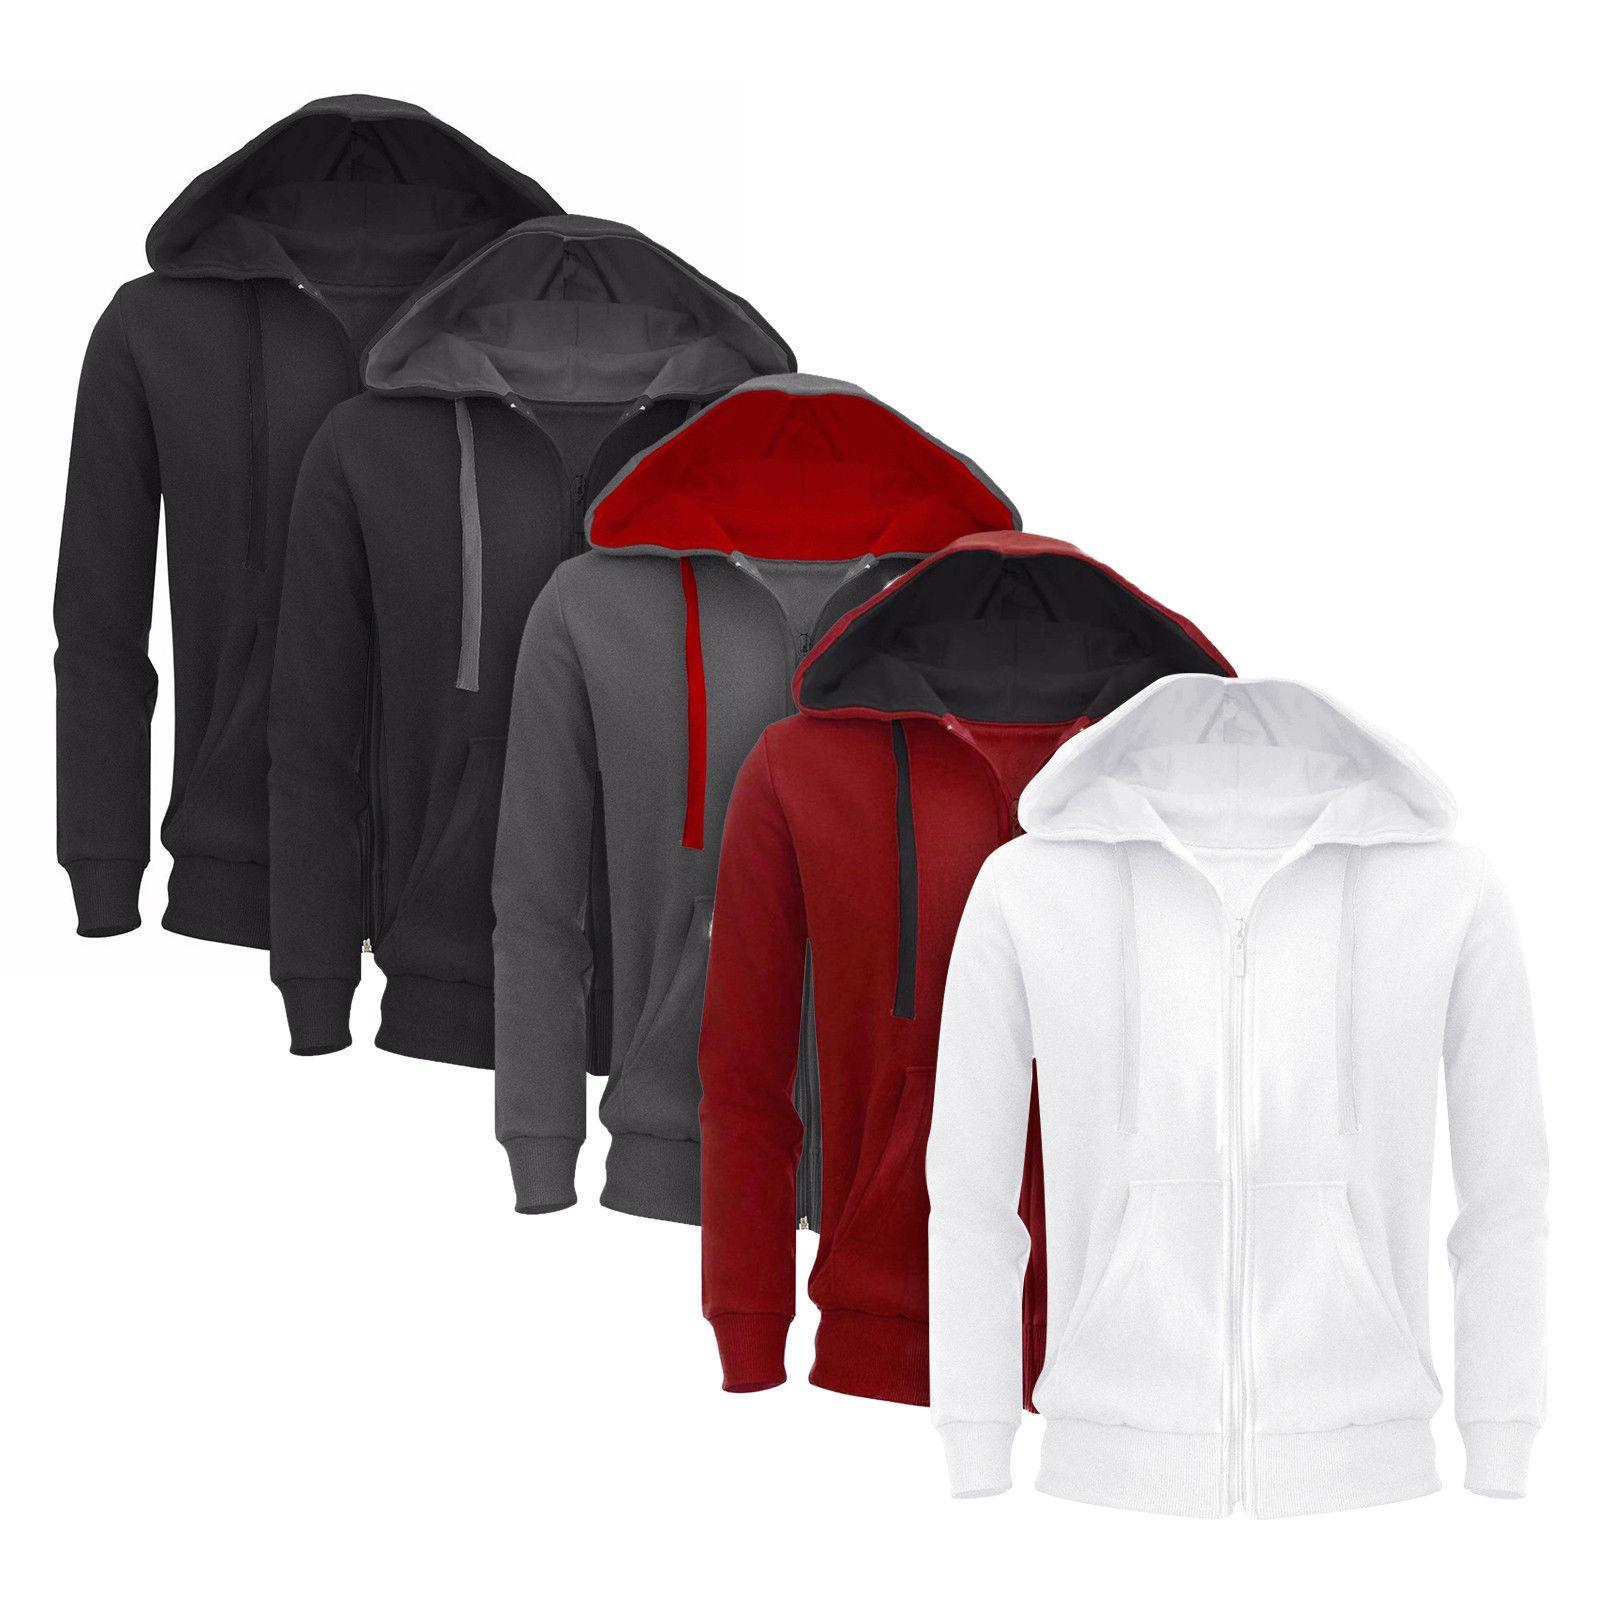 Mens Plain Hooded Fleece Jacket Zipper Casual S-XXXL